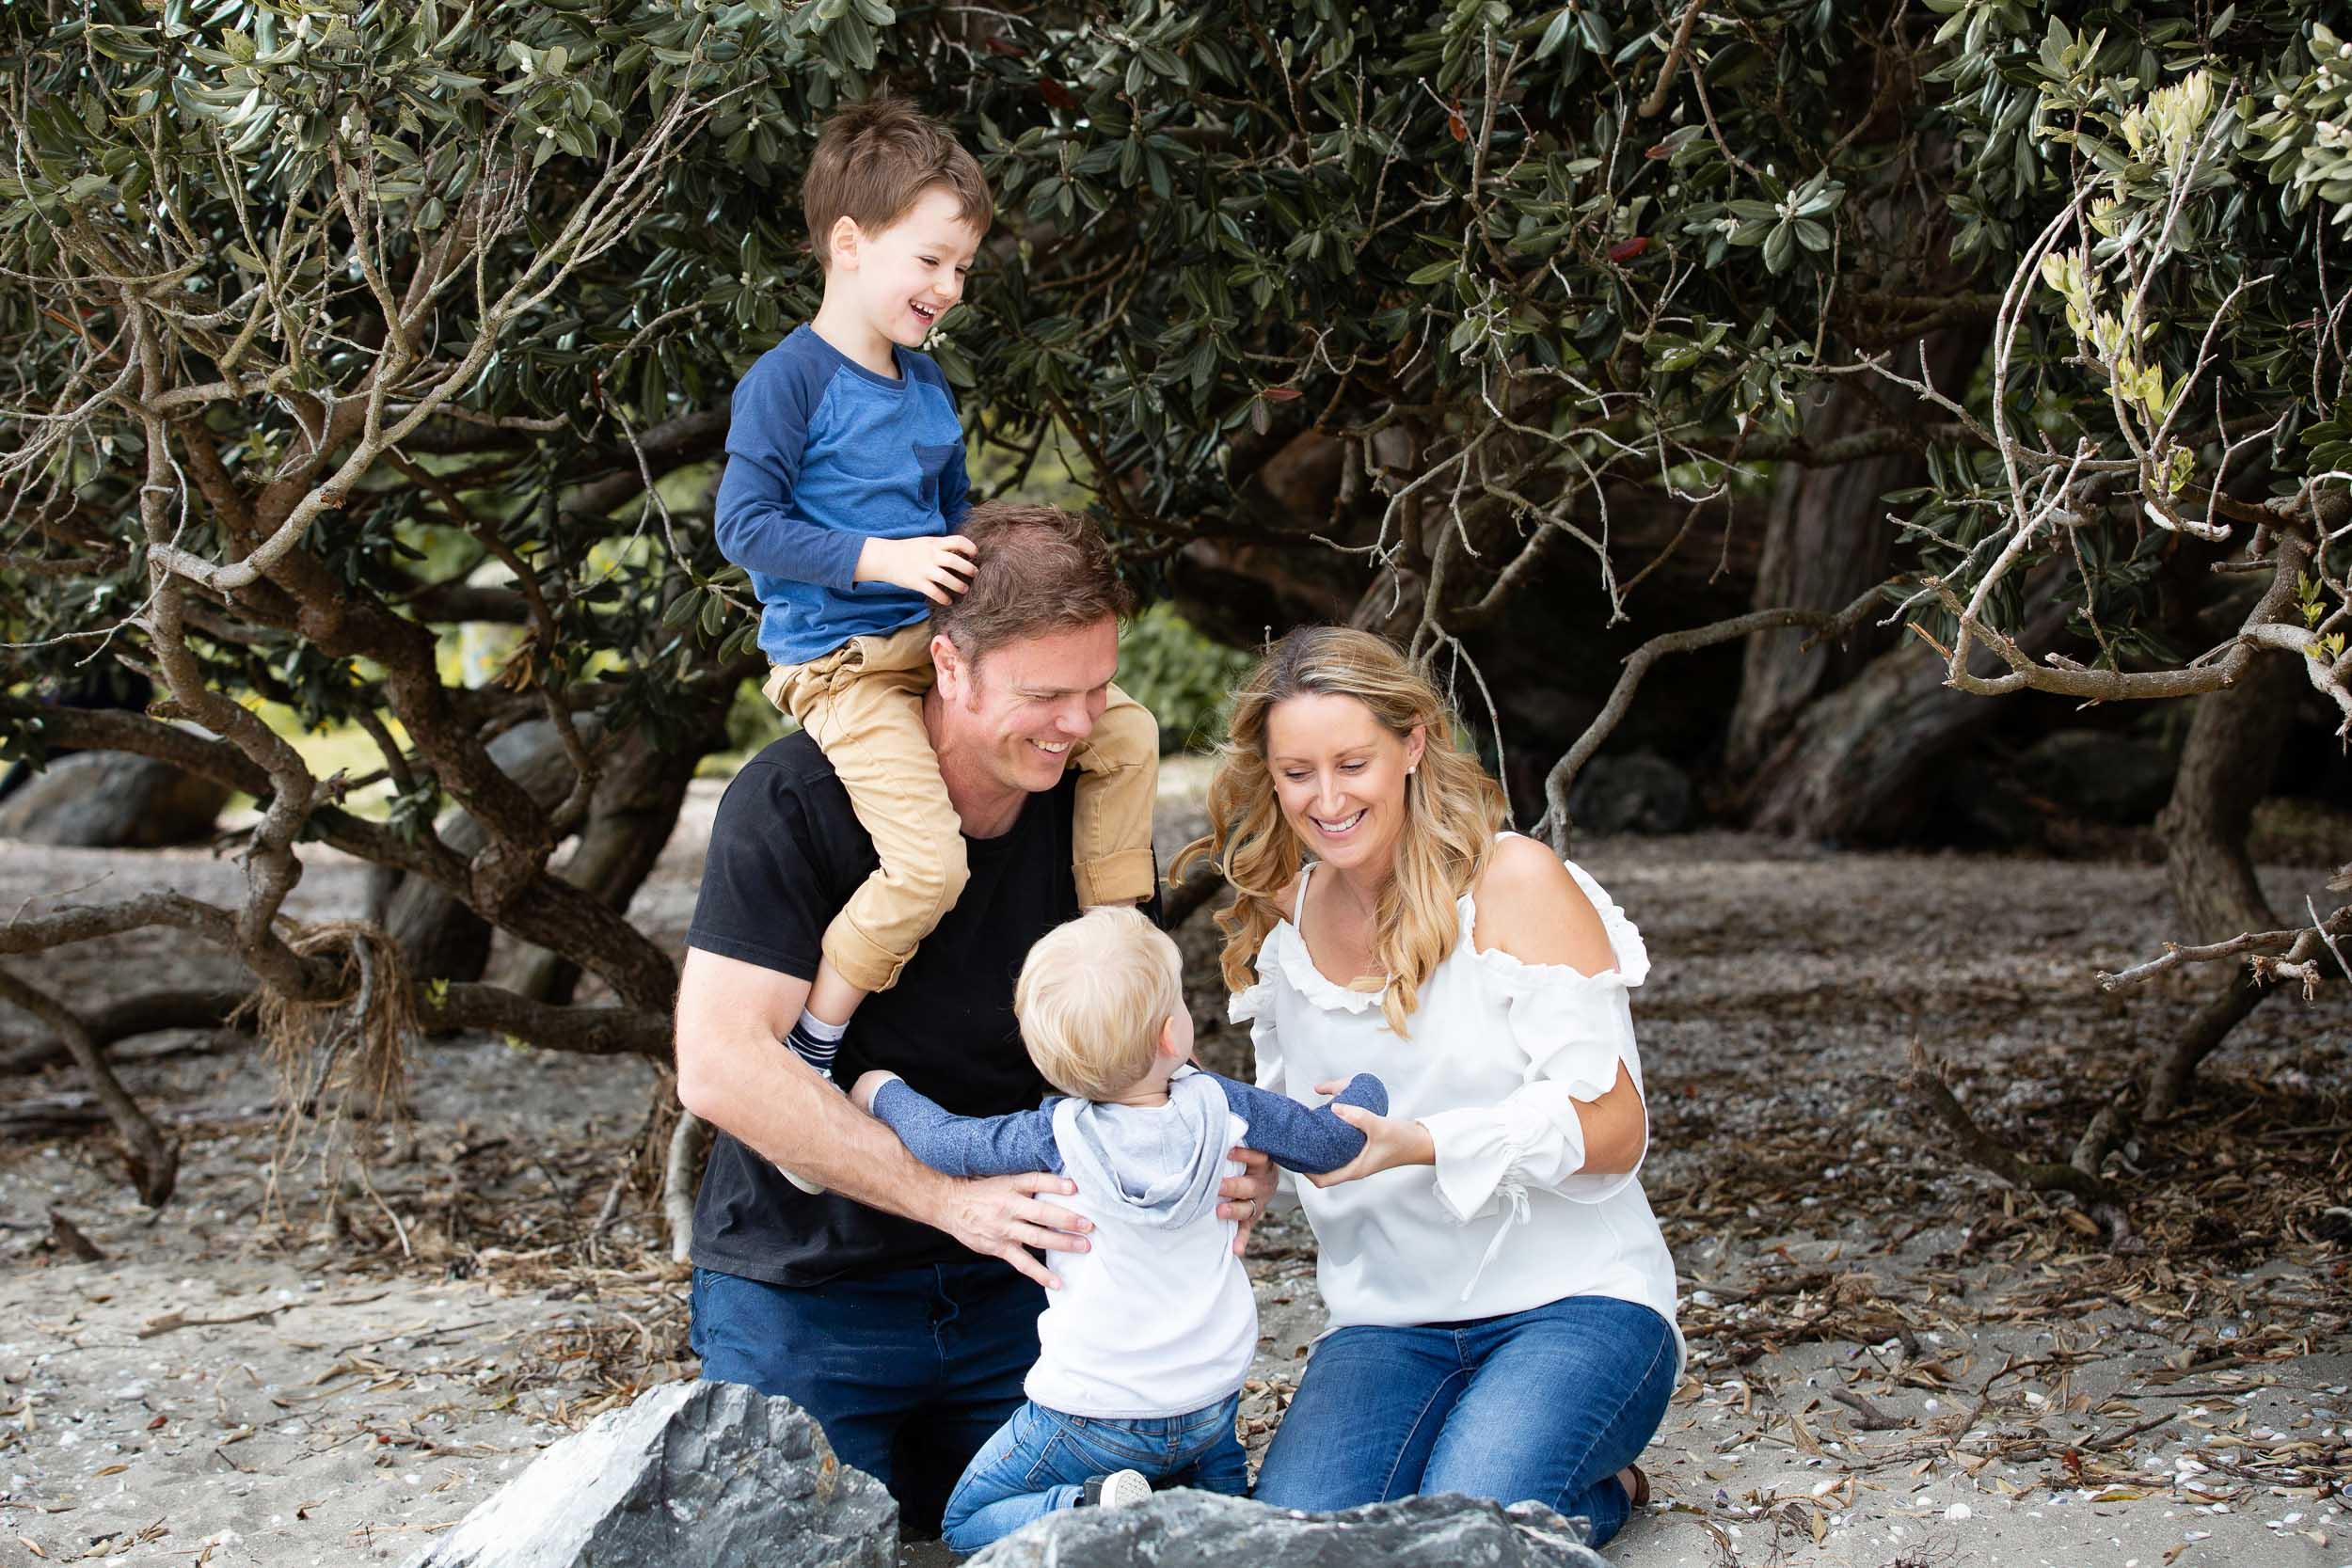 Aucklandfamilyphotographer (8 of 15).jpg